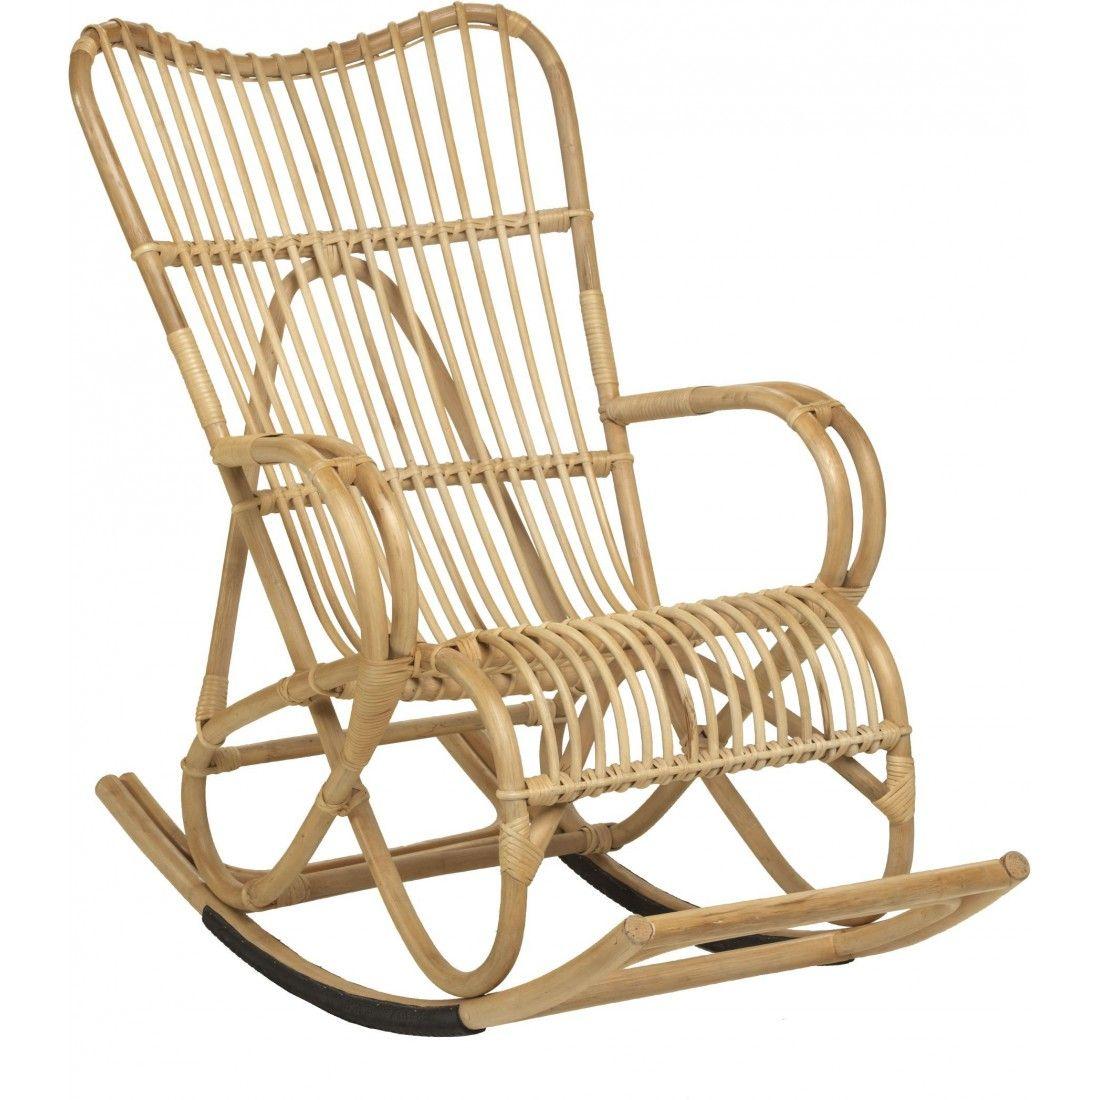 Fauteuil Rocking Chair En Rotin Naturel Vintage Marlene Chaise A Bascule Fauteuil A Bascule En Rotin Fauteuil Rotin